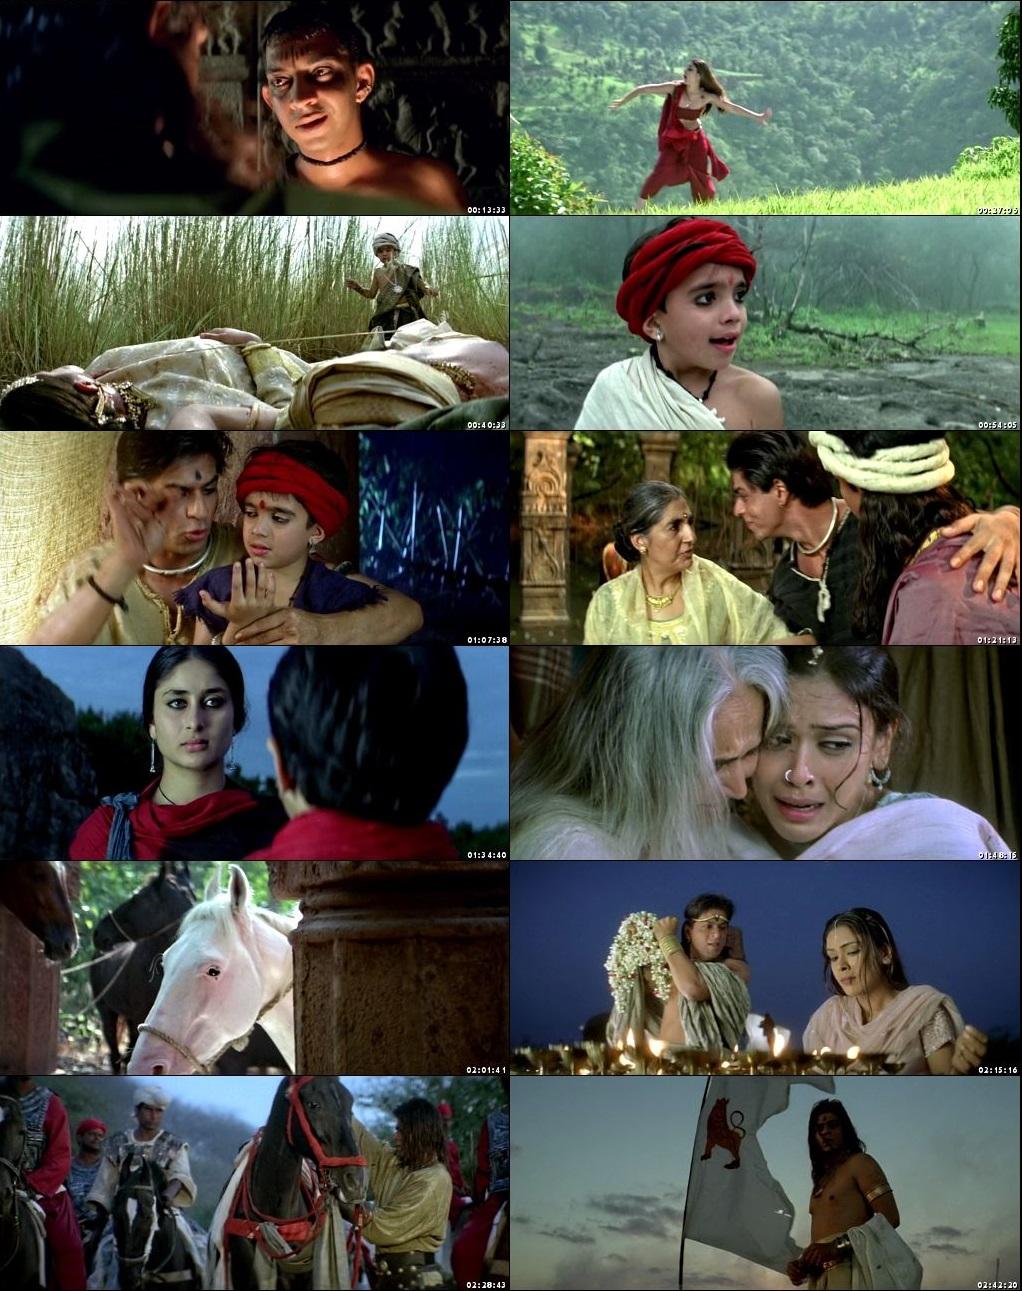 Asoka 2001 Full Movie Download 720p HDRip, BluRay, DVDRip, mkv, Mp4 1080p Full Hd